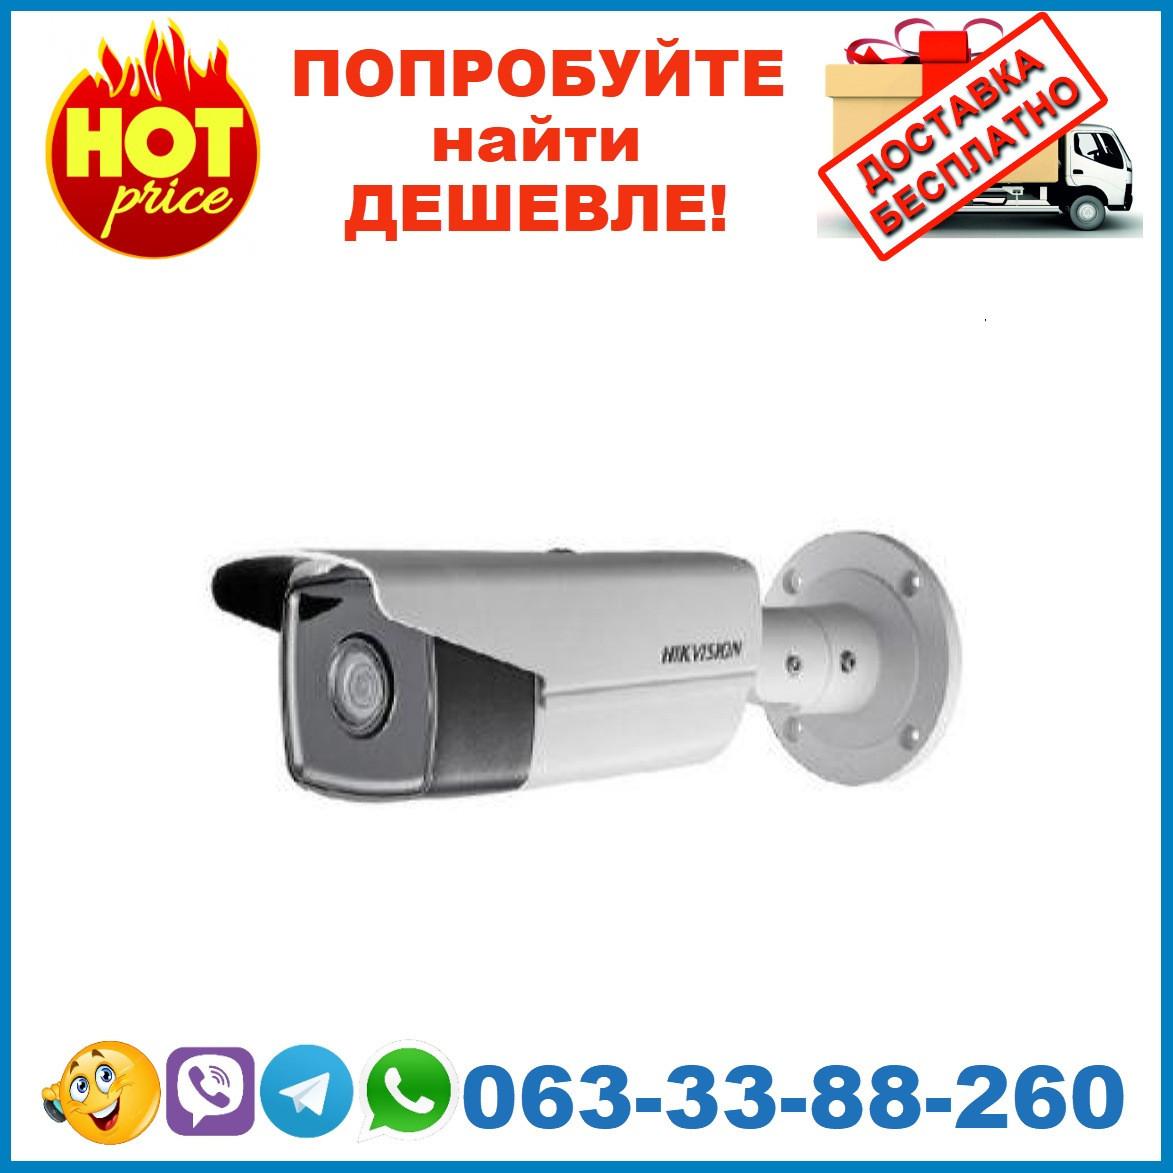 DS-2CD2T83G0-I8 (4 мм)  8 Мп IP видеокамера Hikvision с функциями IVS и детектором лиц